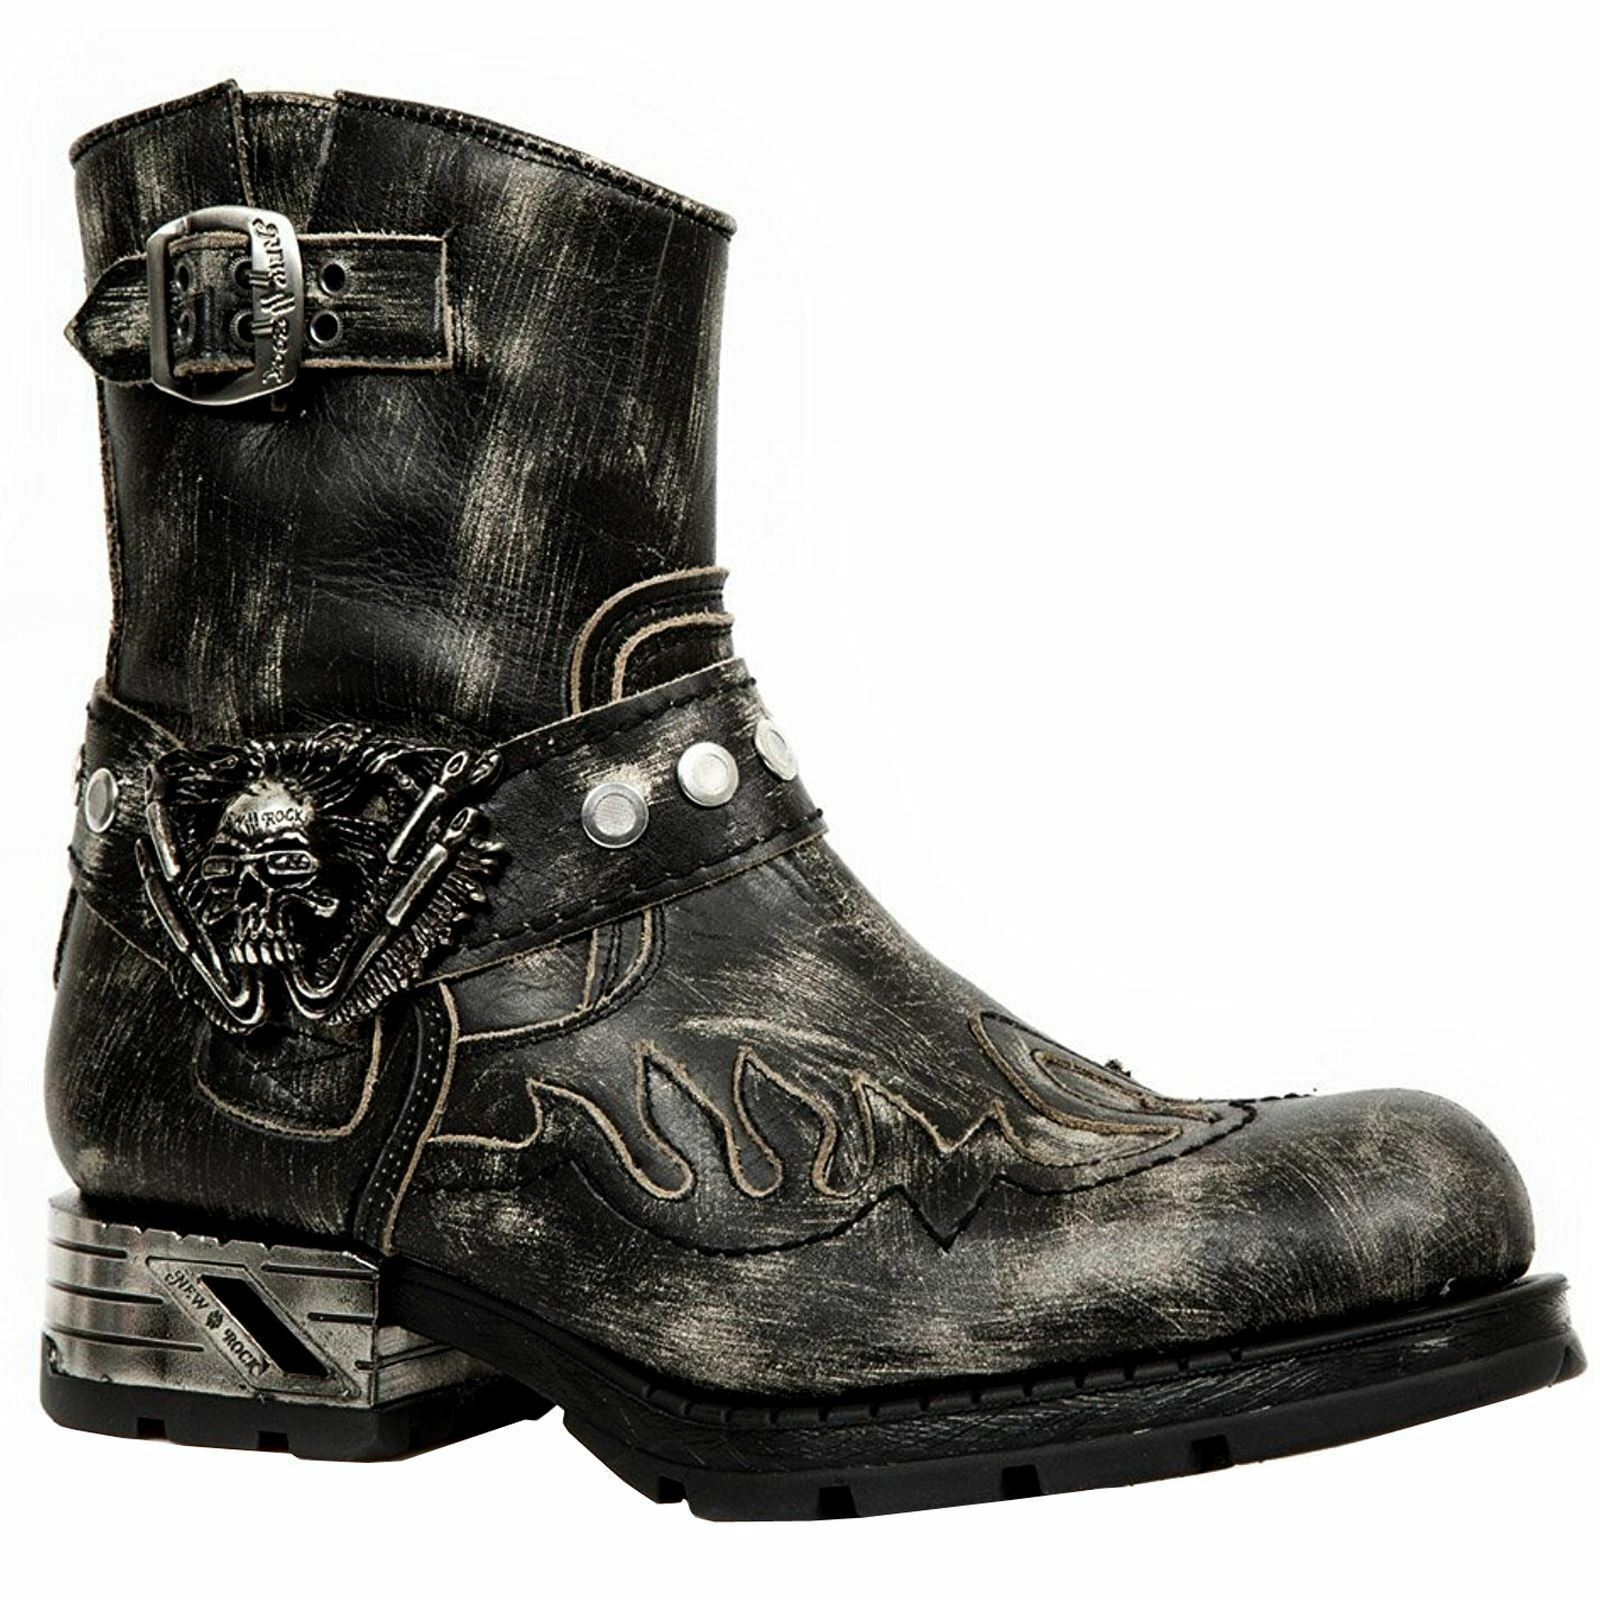 NEU Rock Unisex M.MR041-S3 Leder Stiefel